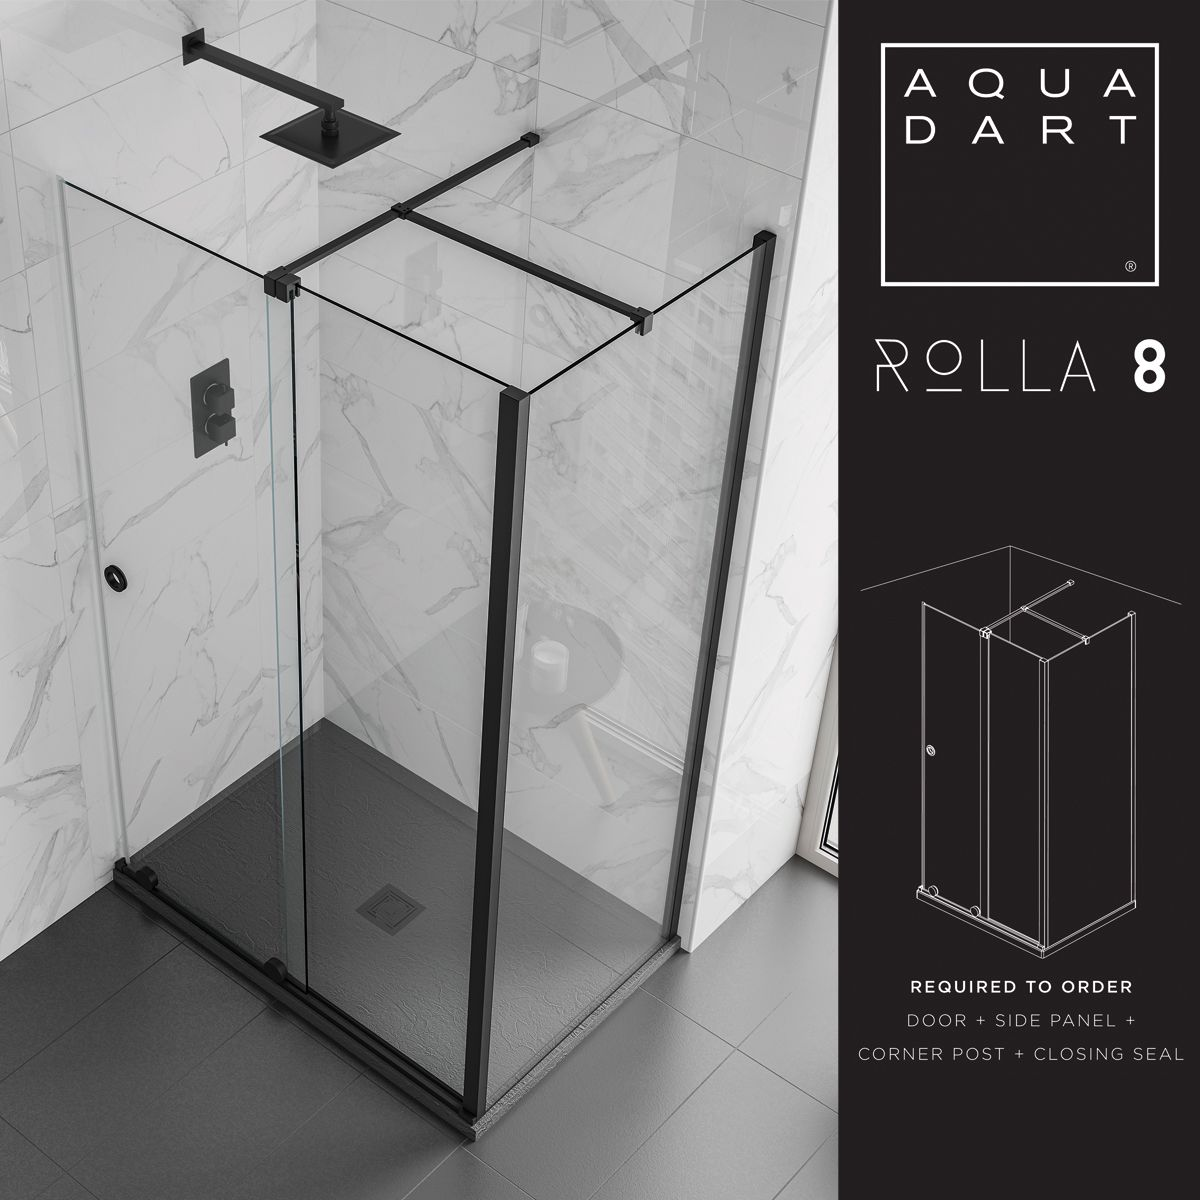 Aquadart Rolla 8 Sliding Shower Enclosure with Corner Post Configuration